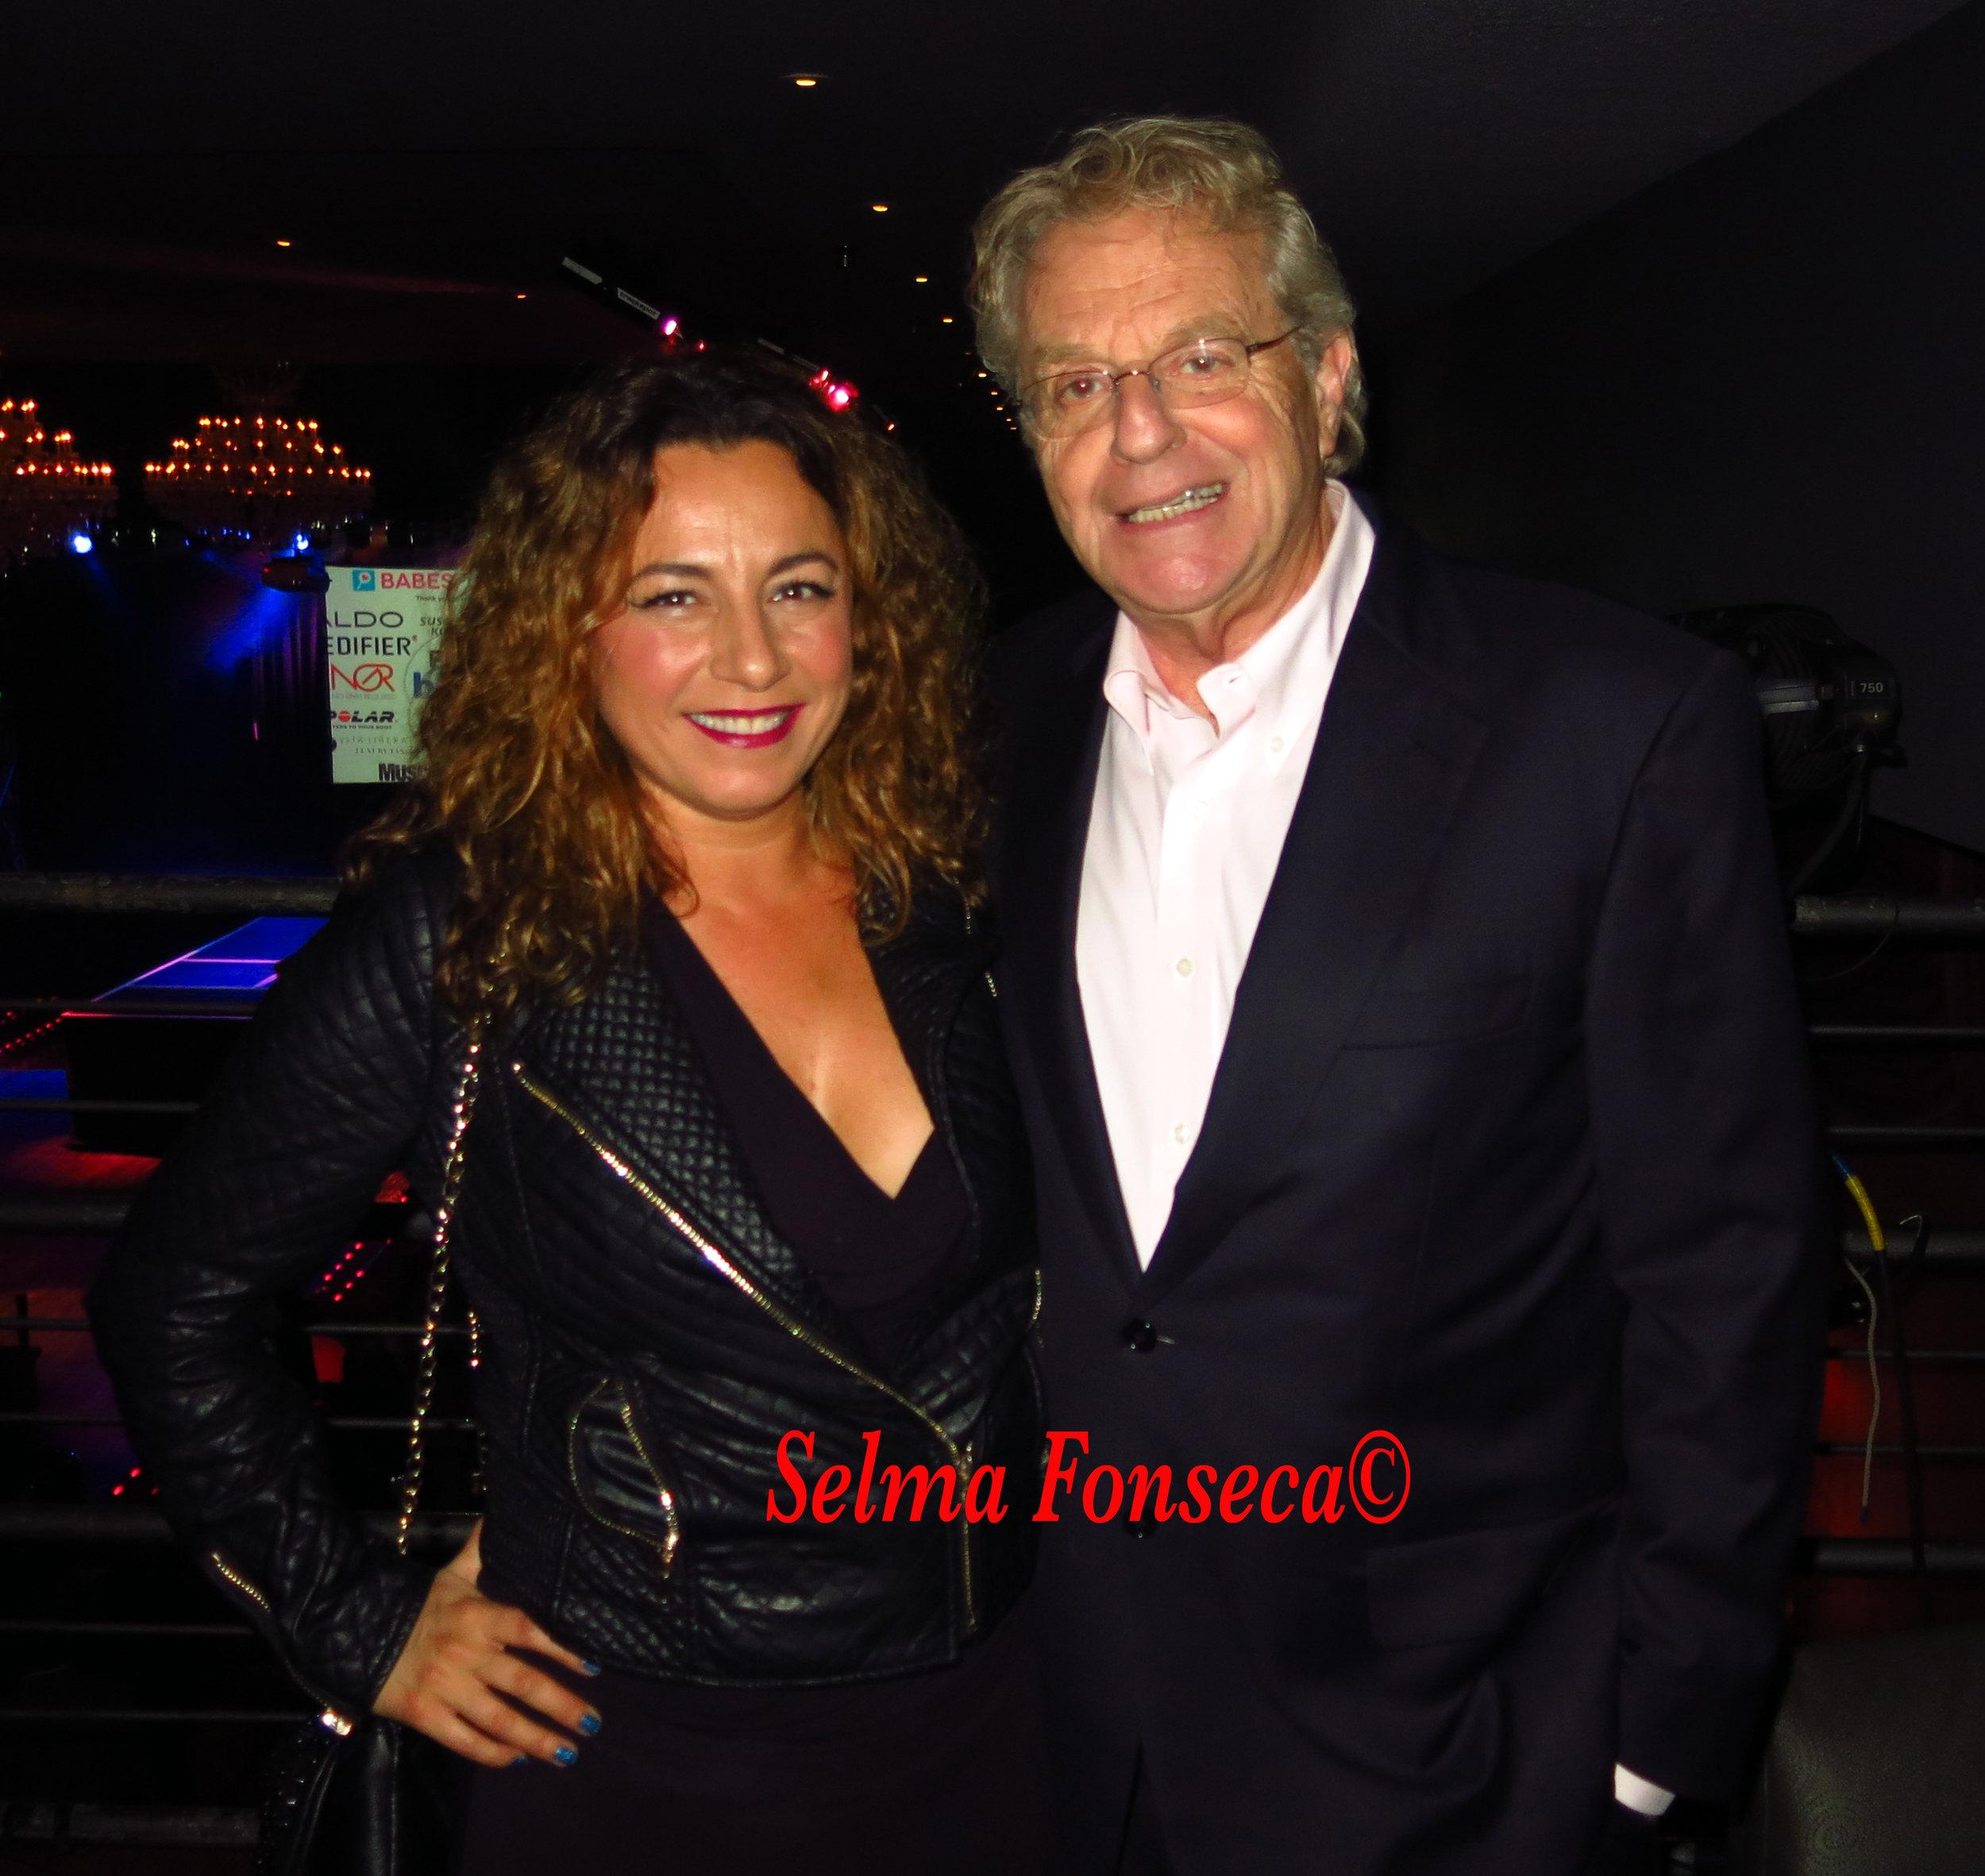 Jerry Springer Selma Fonseca.jpg